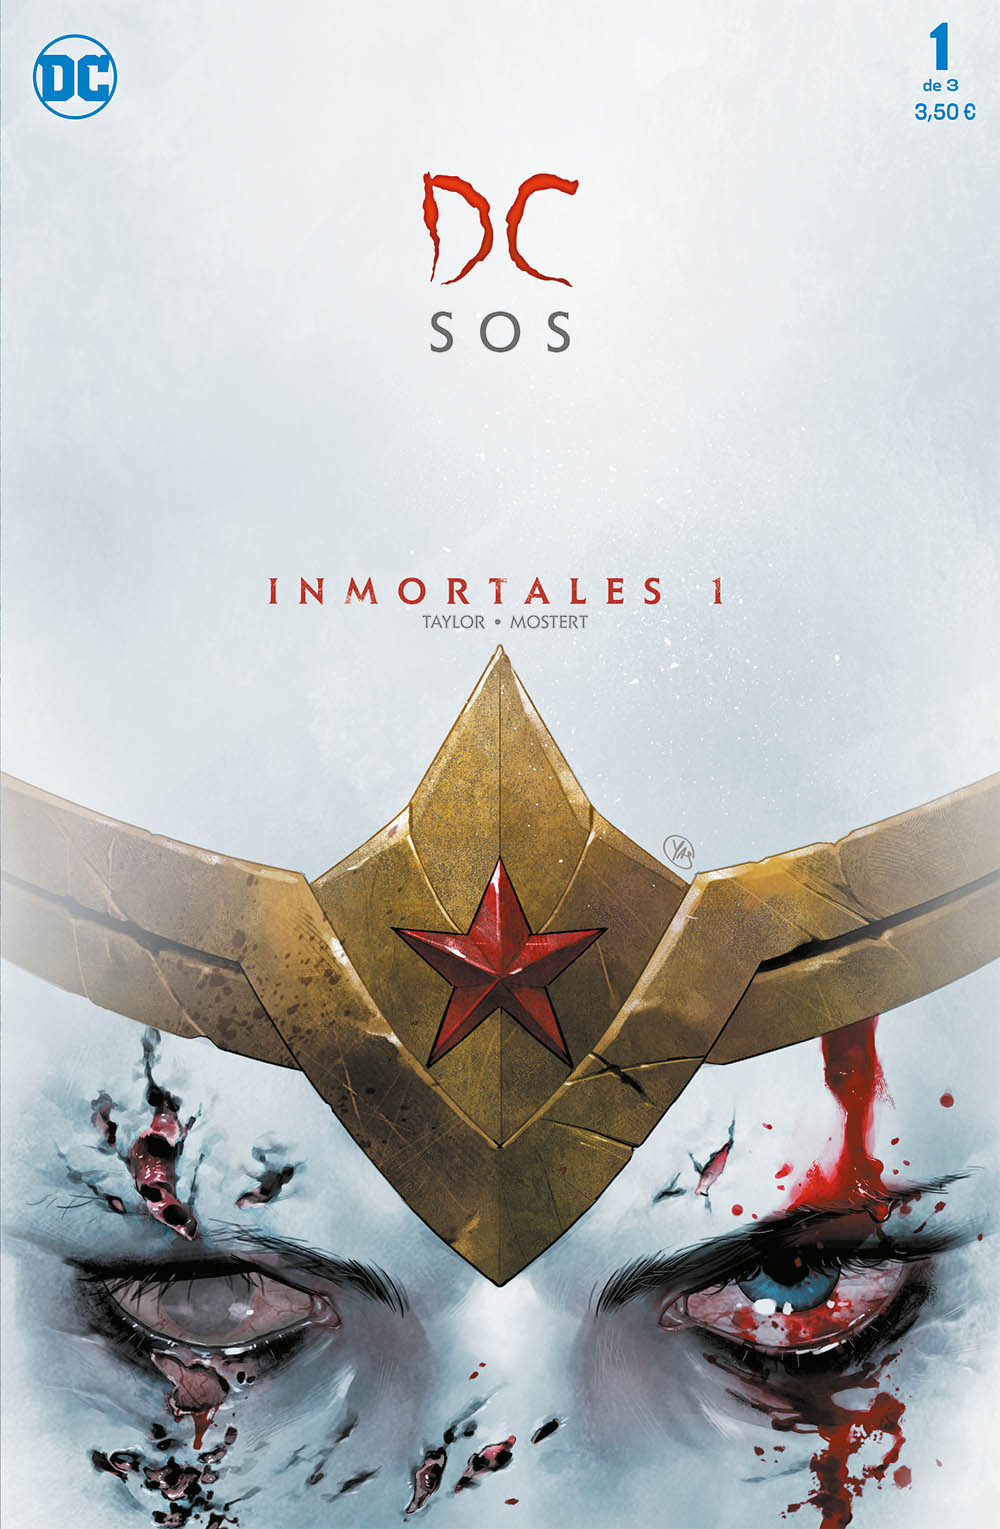 Dcsos: Inmortales núm. 01 de 3